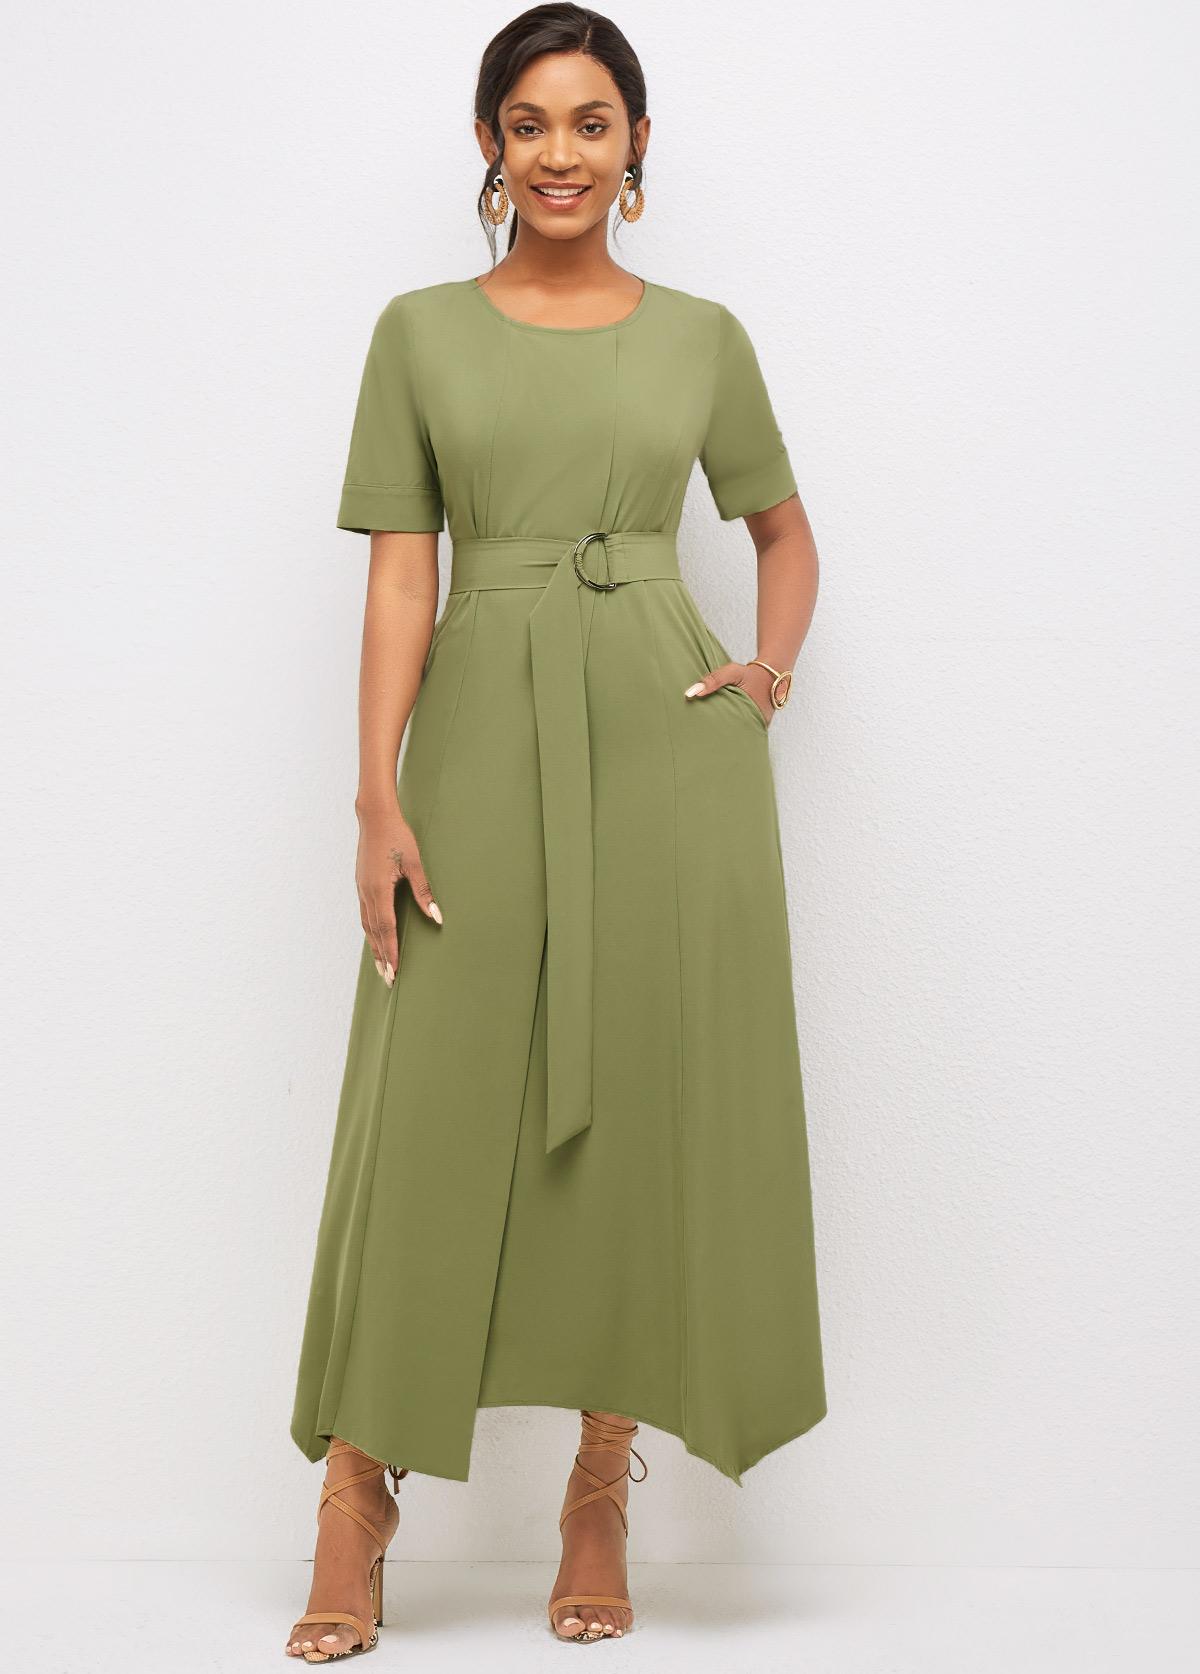 ROTITA Asymmetric Hem Round Neck Solid Dress